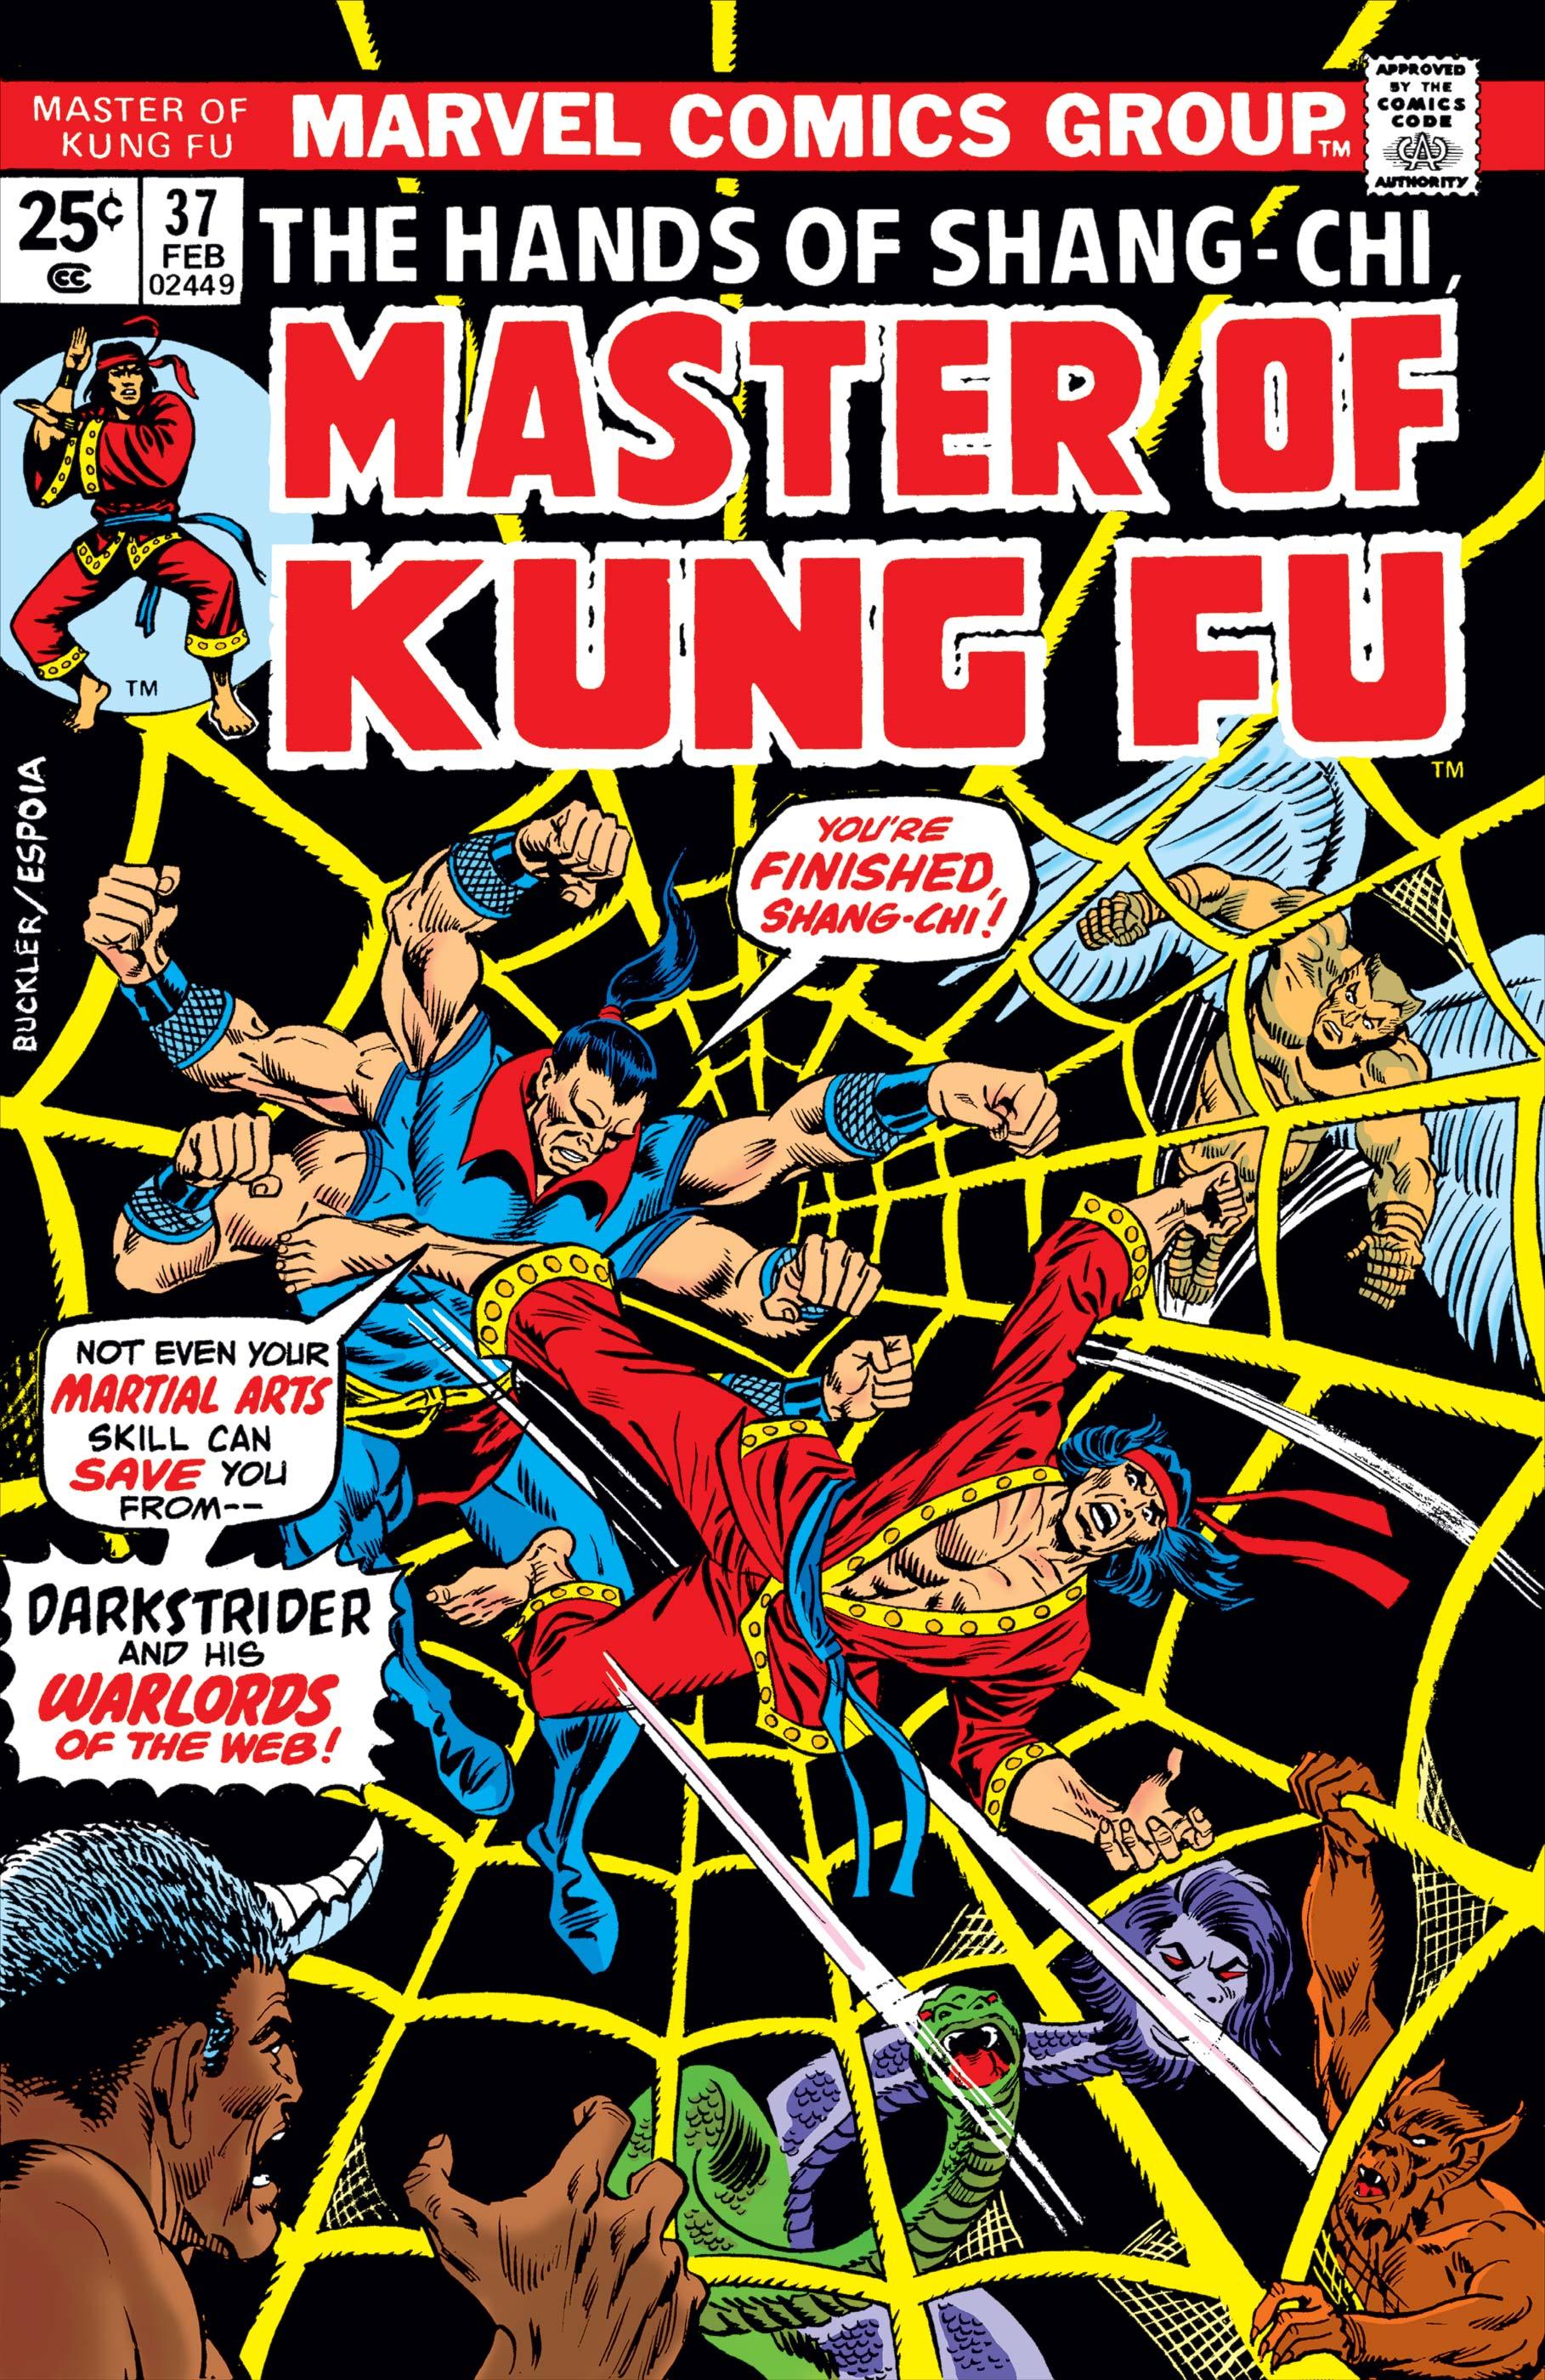 Master of Kung Fu (1974) #37